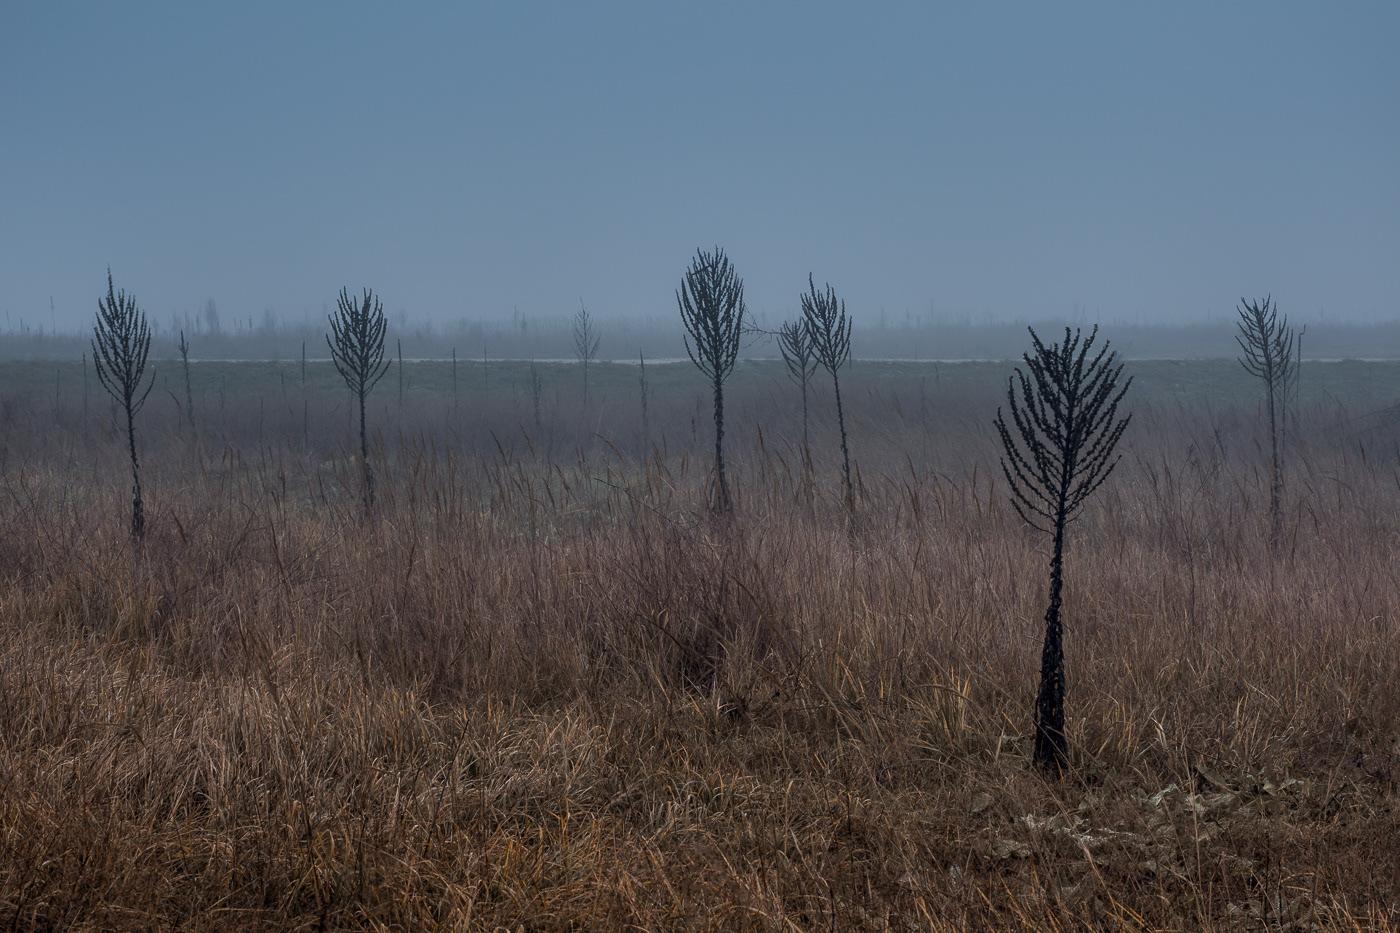 Landscape Minimalism Photography  simplicity art minimal Moody Nature moodboard